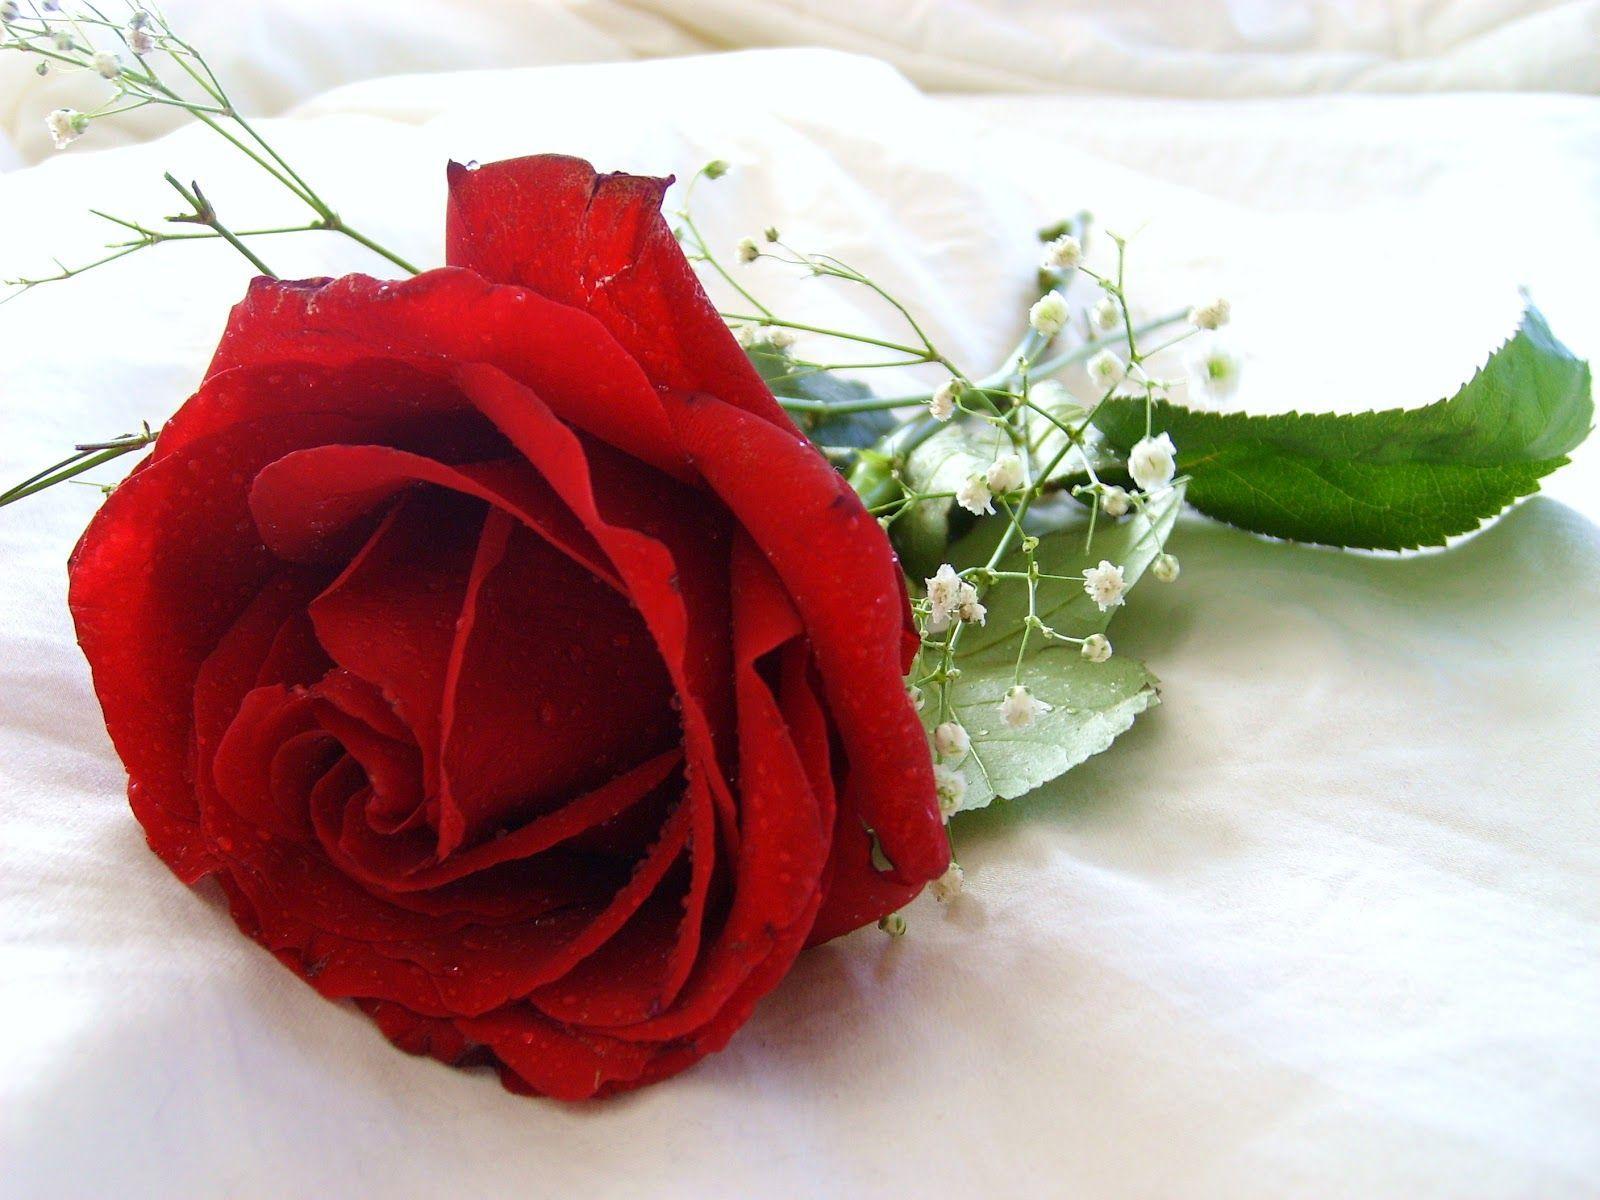 Rose Flower Wallpapers - Top Free Rose